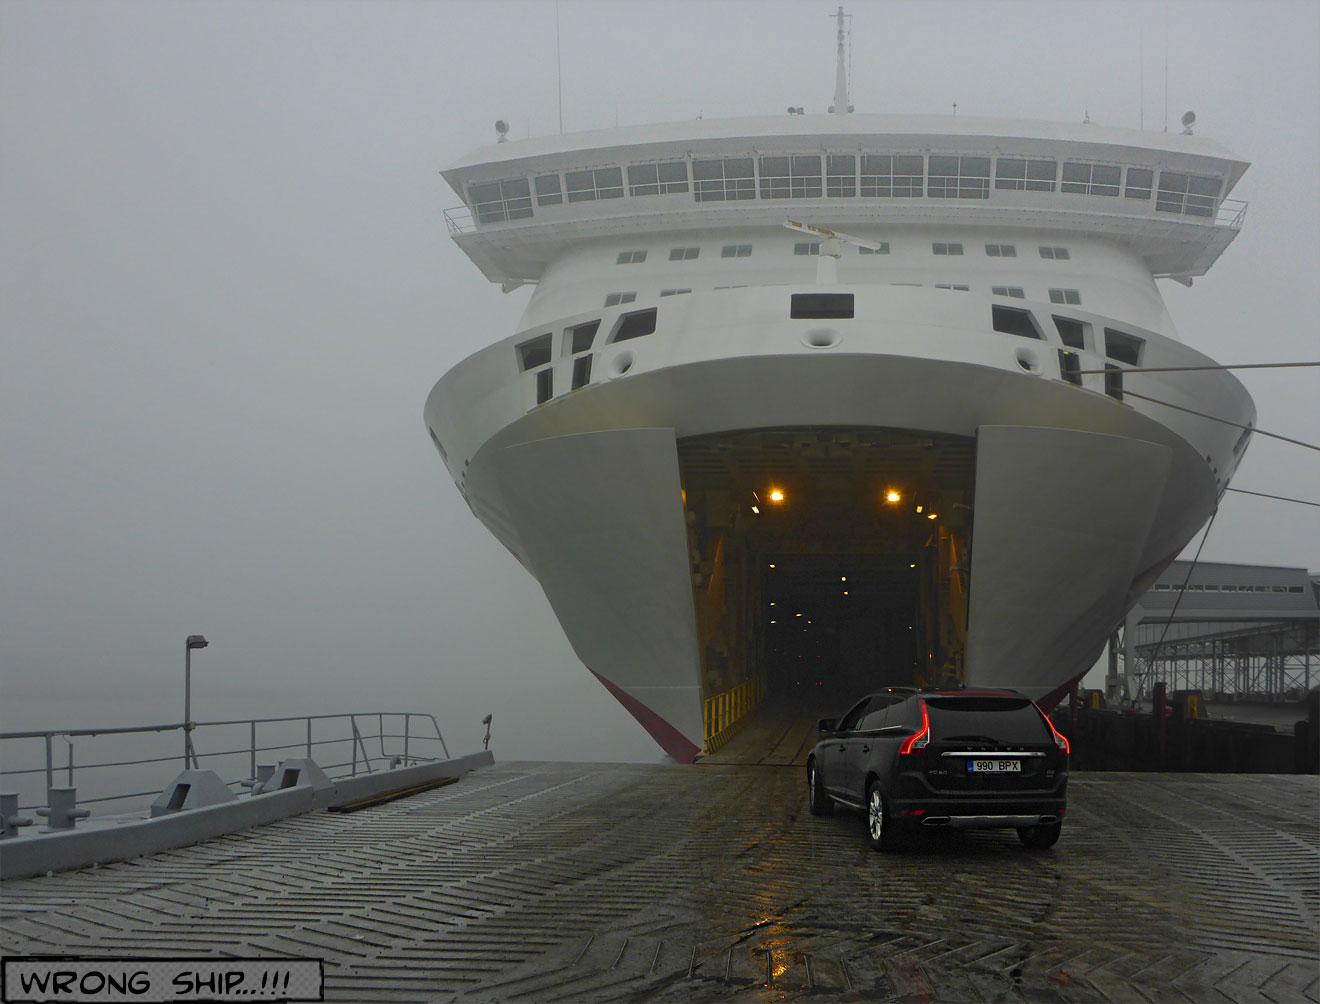 Fährschiff offener Bug